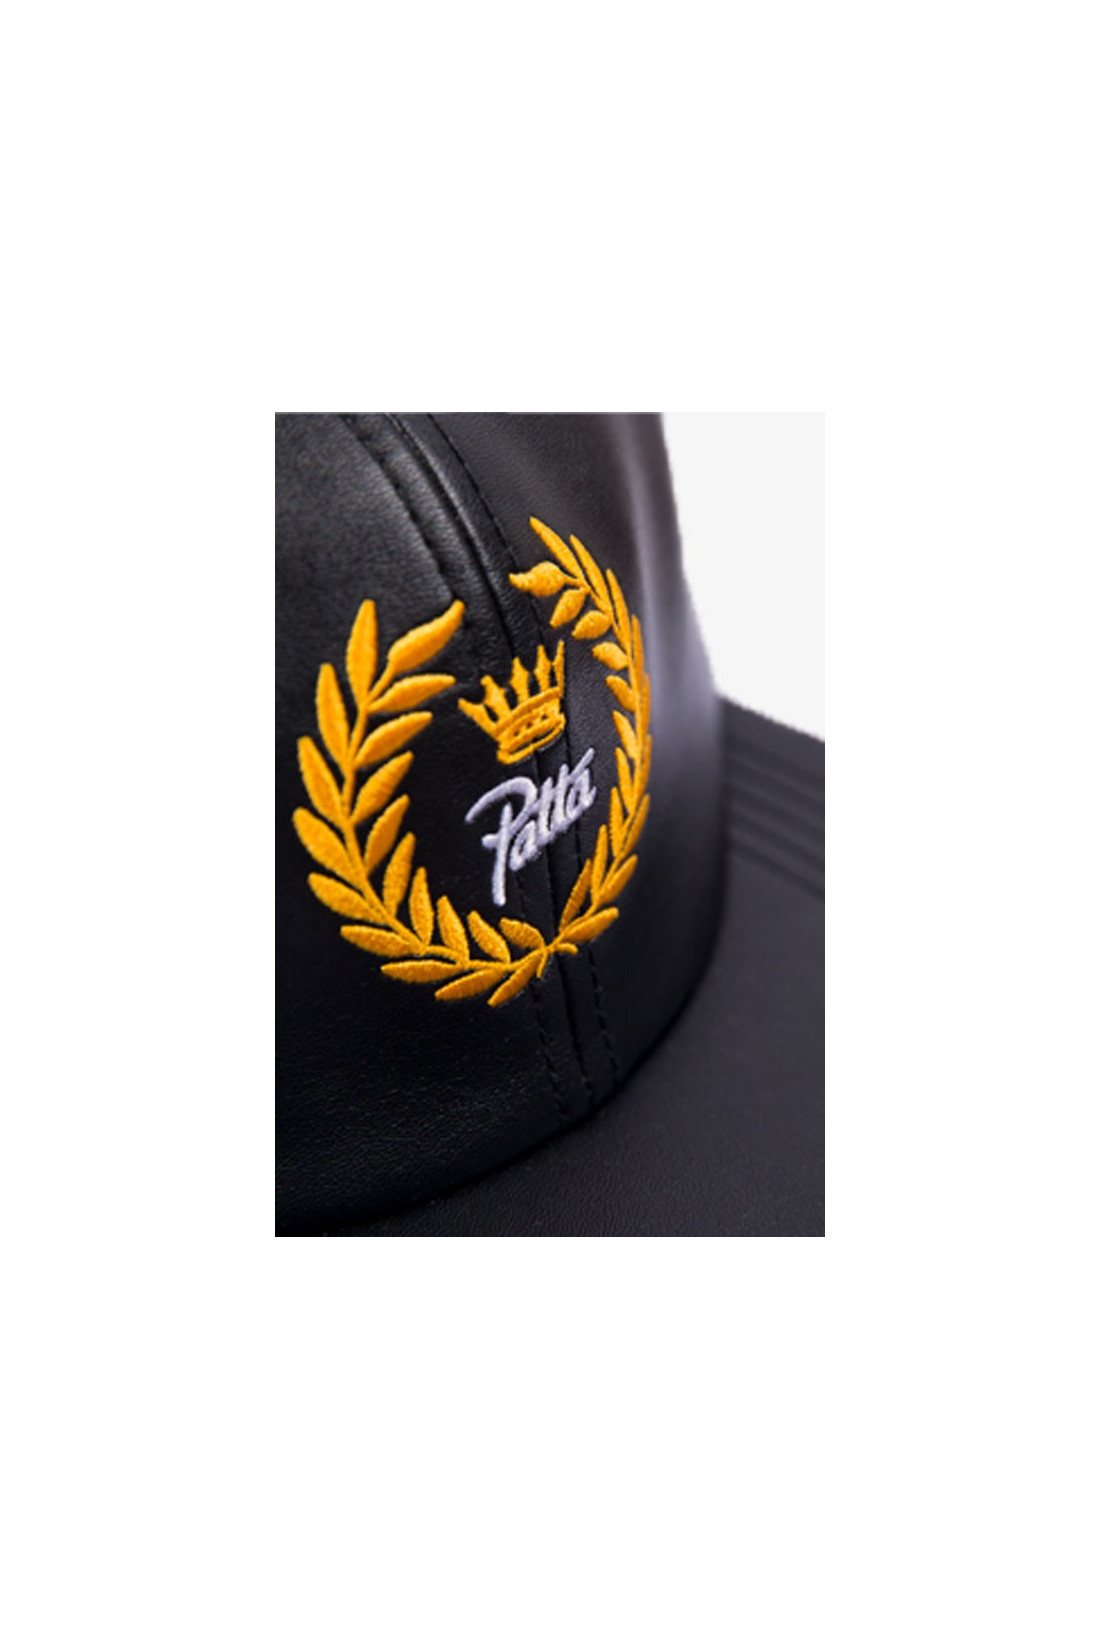 PATTA / Patta vegan leather snapback Black